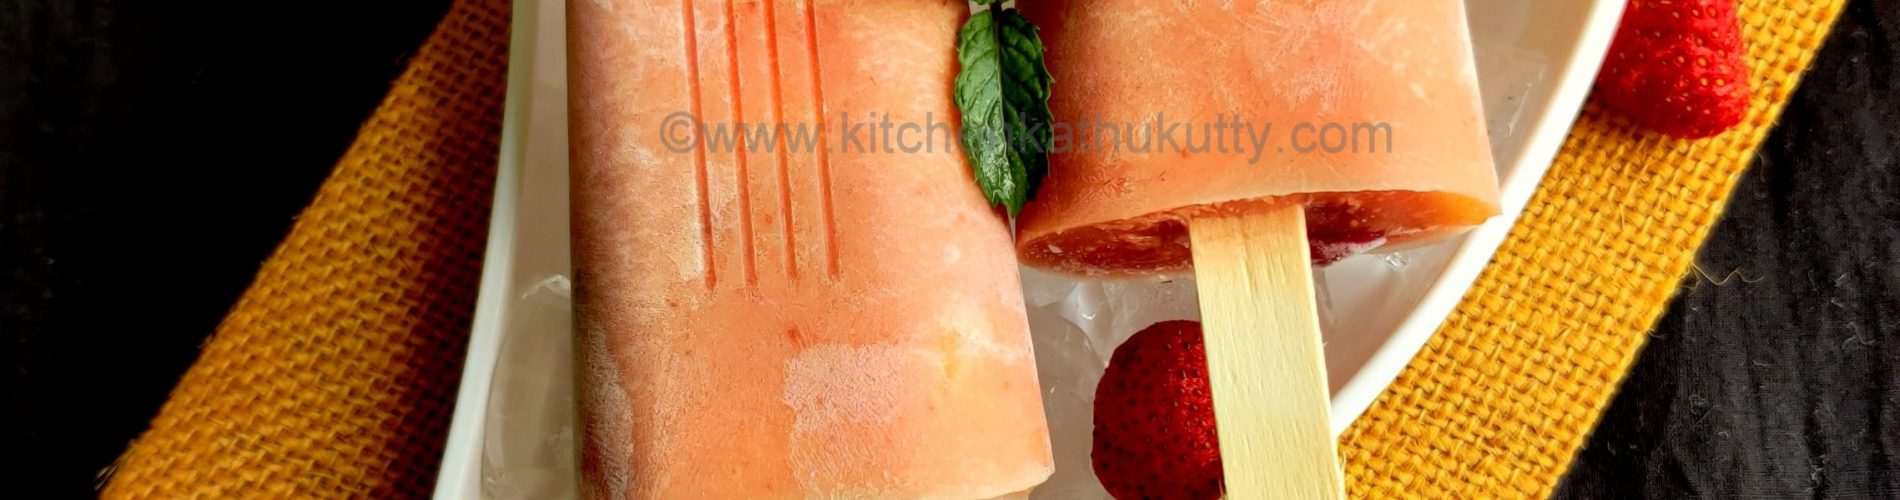 Strawberry Custard Popsicle recipe